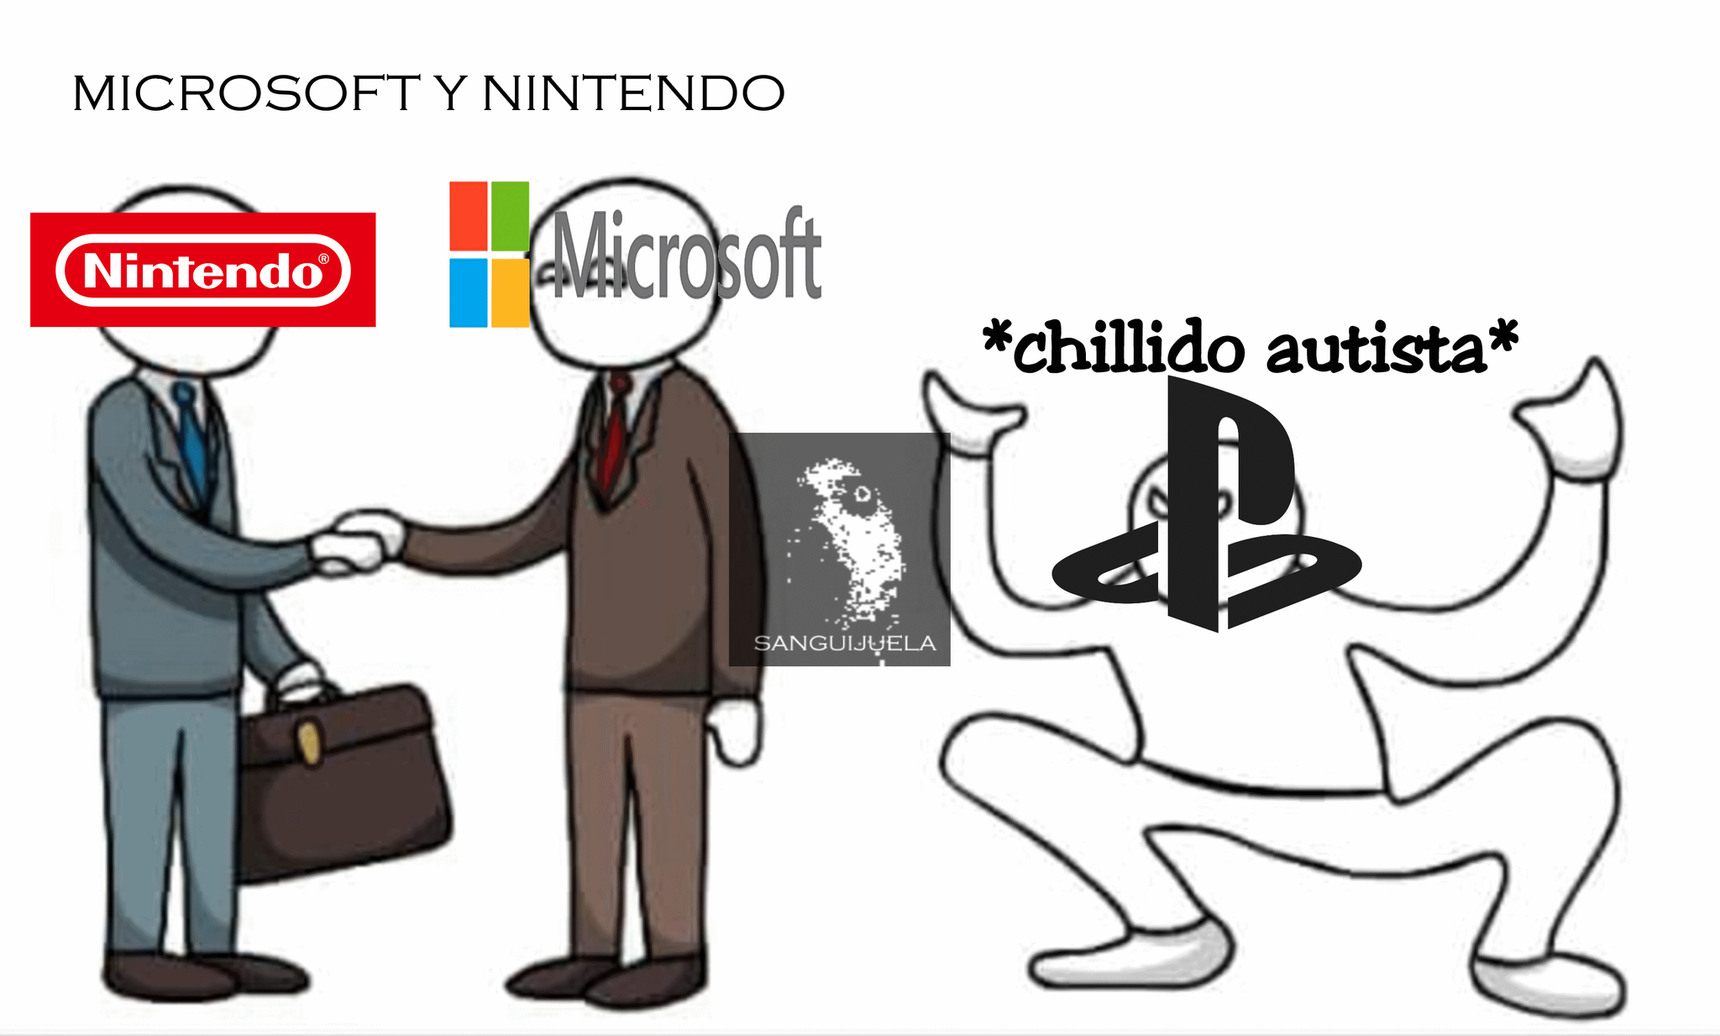 alguien emulo x-box en la switch - meme